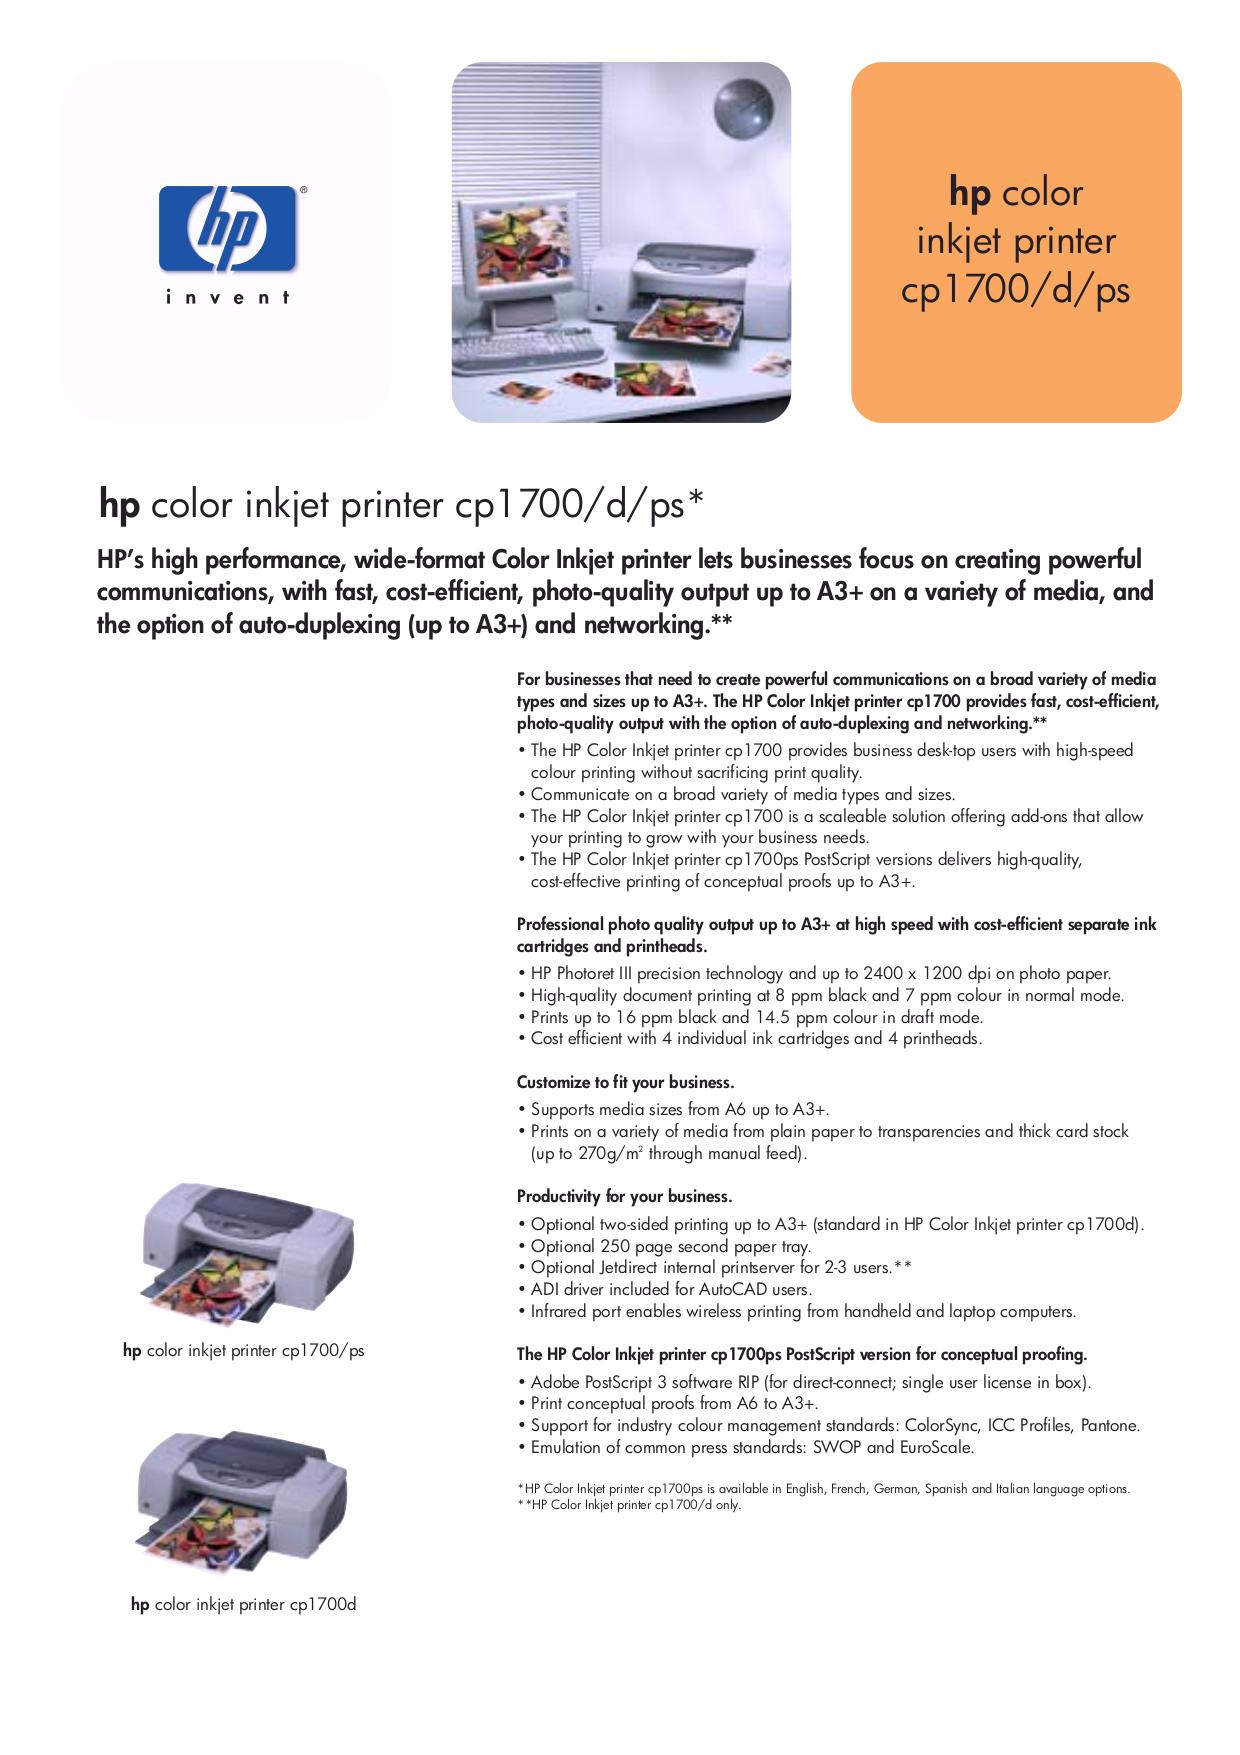 pdf for HP Printer Business Inkjet cp1700 manual